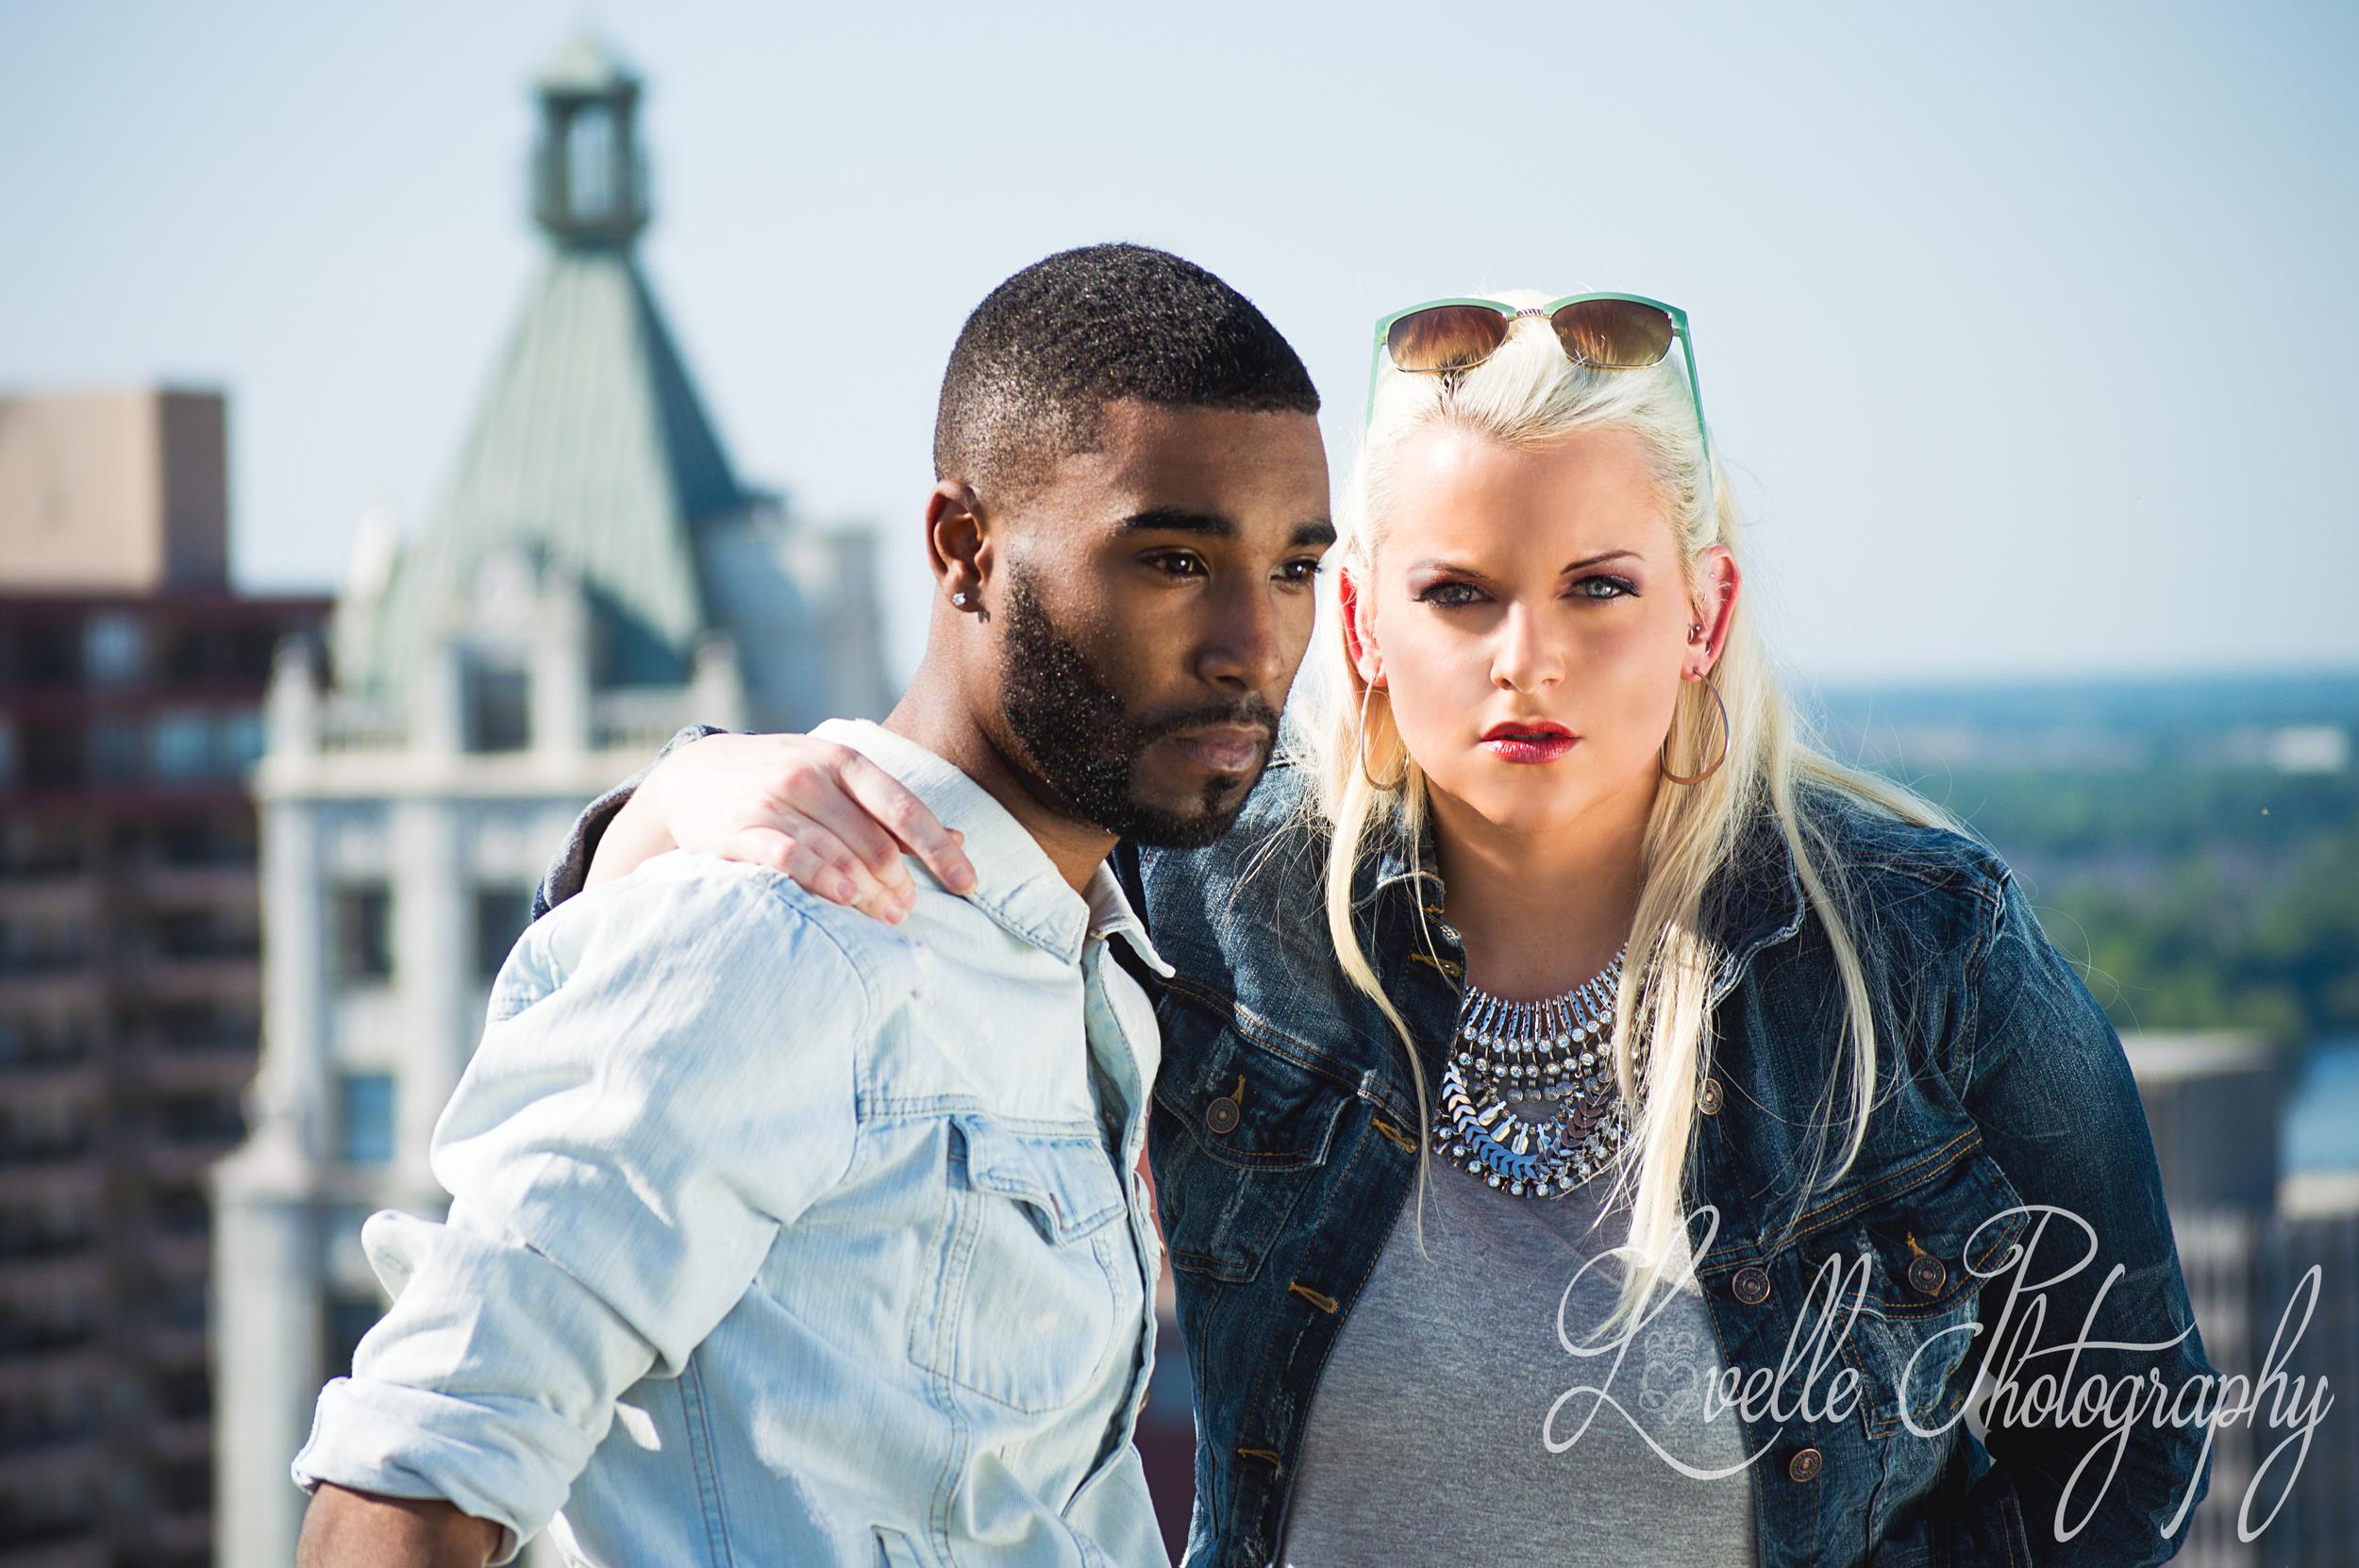 Model: Grant Kee and Candace Hadley  HMUA: Meghan J.